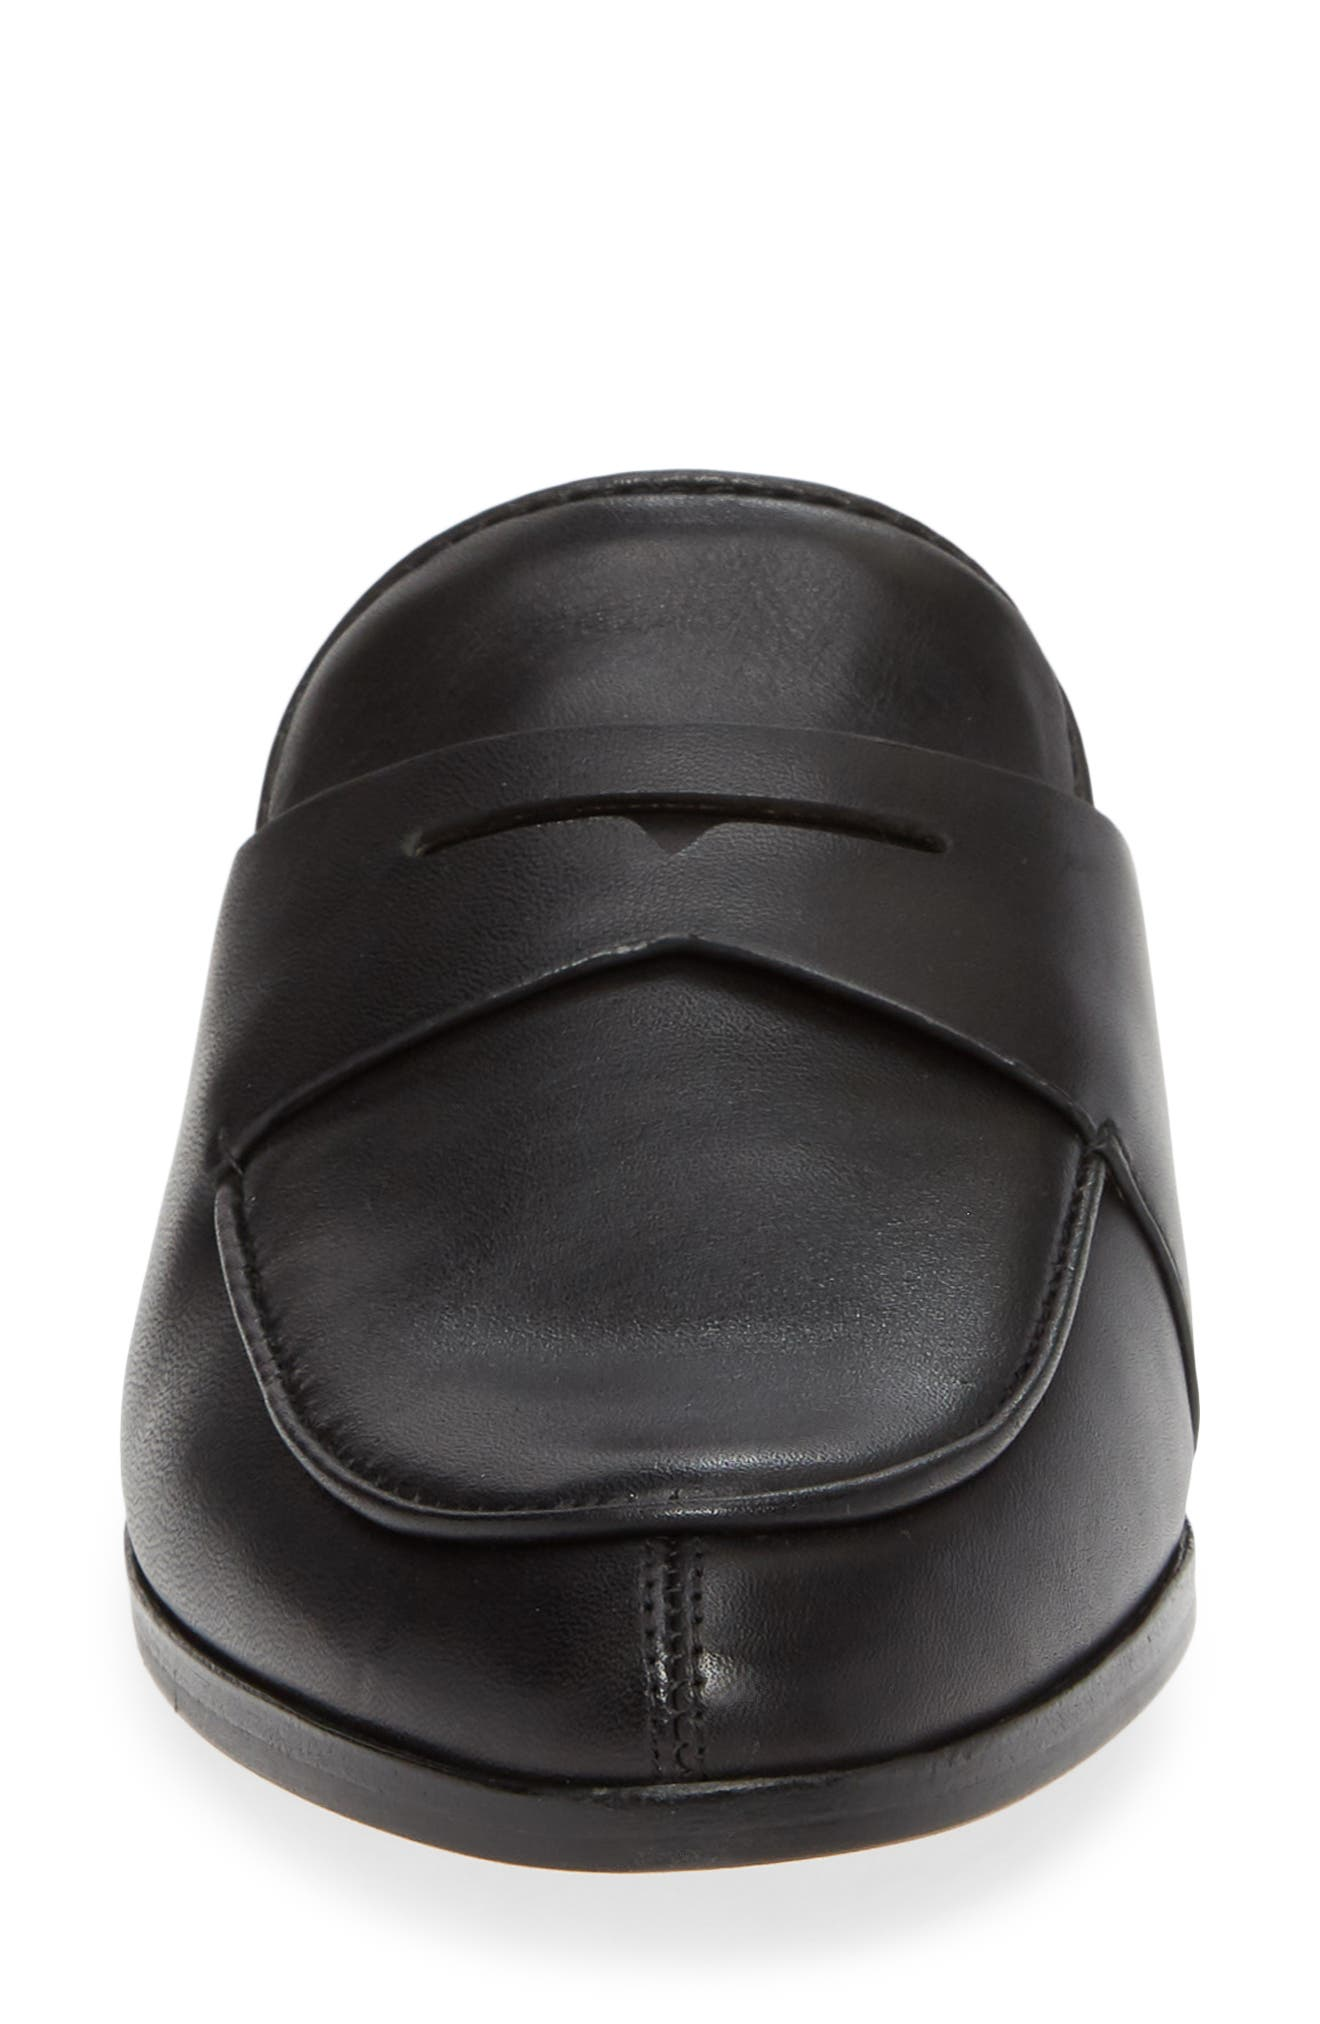 LOUISE ET CIE, Dugan Flat Loafer Mule, Alternate thumbnail 4, color, BLACK/BLACK LEATHER